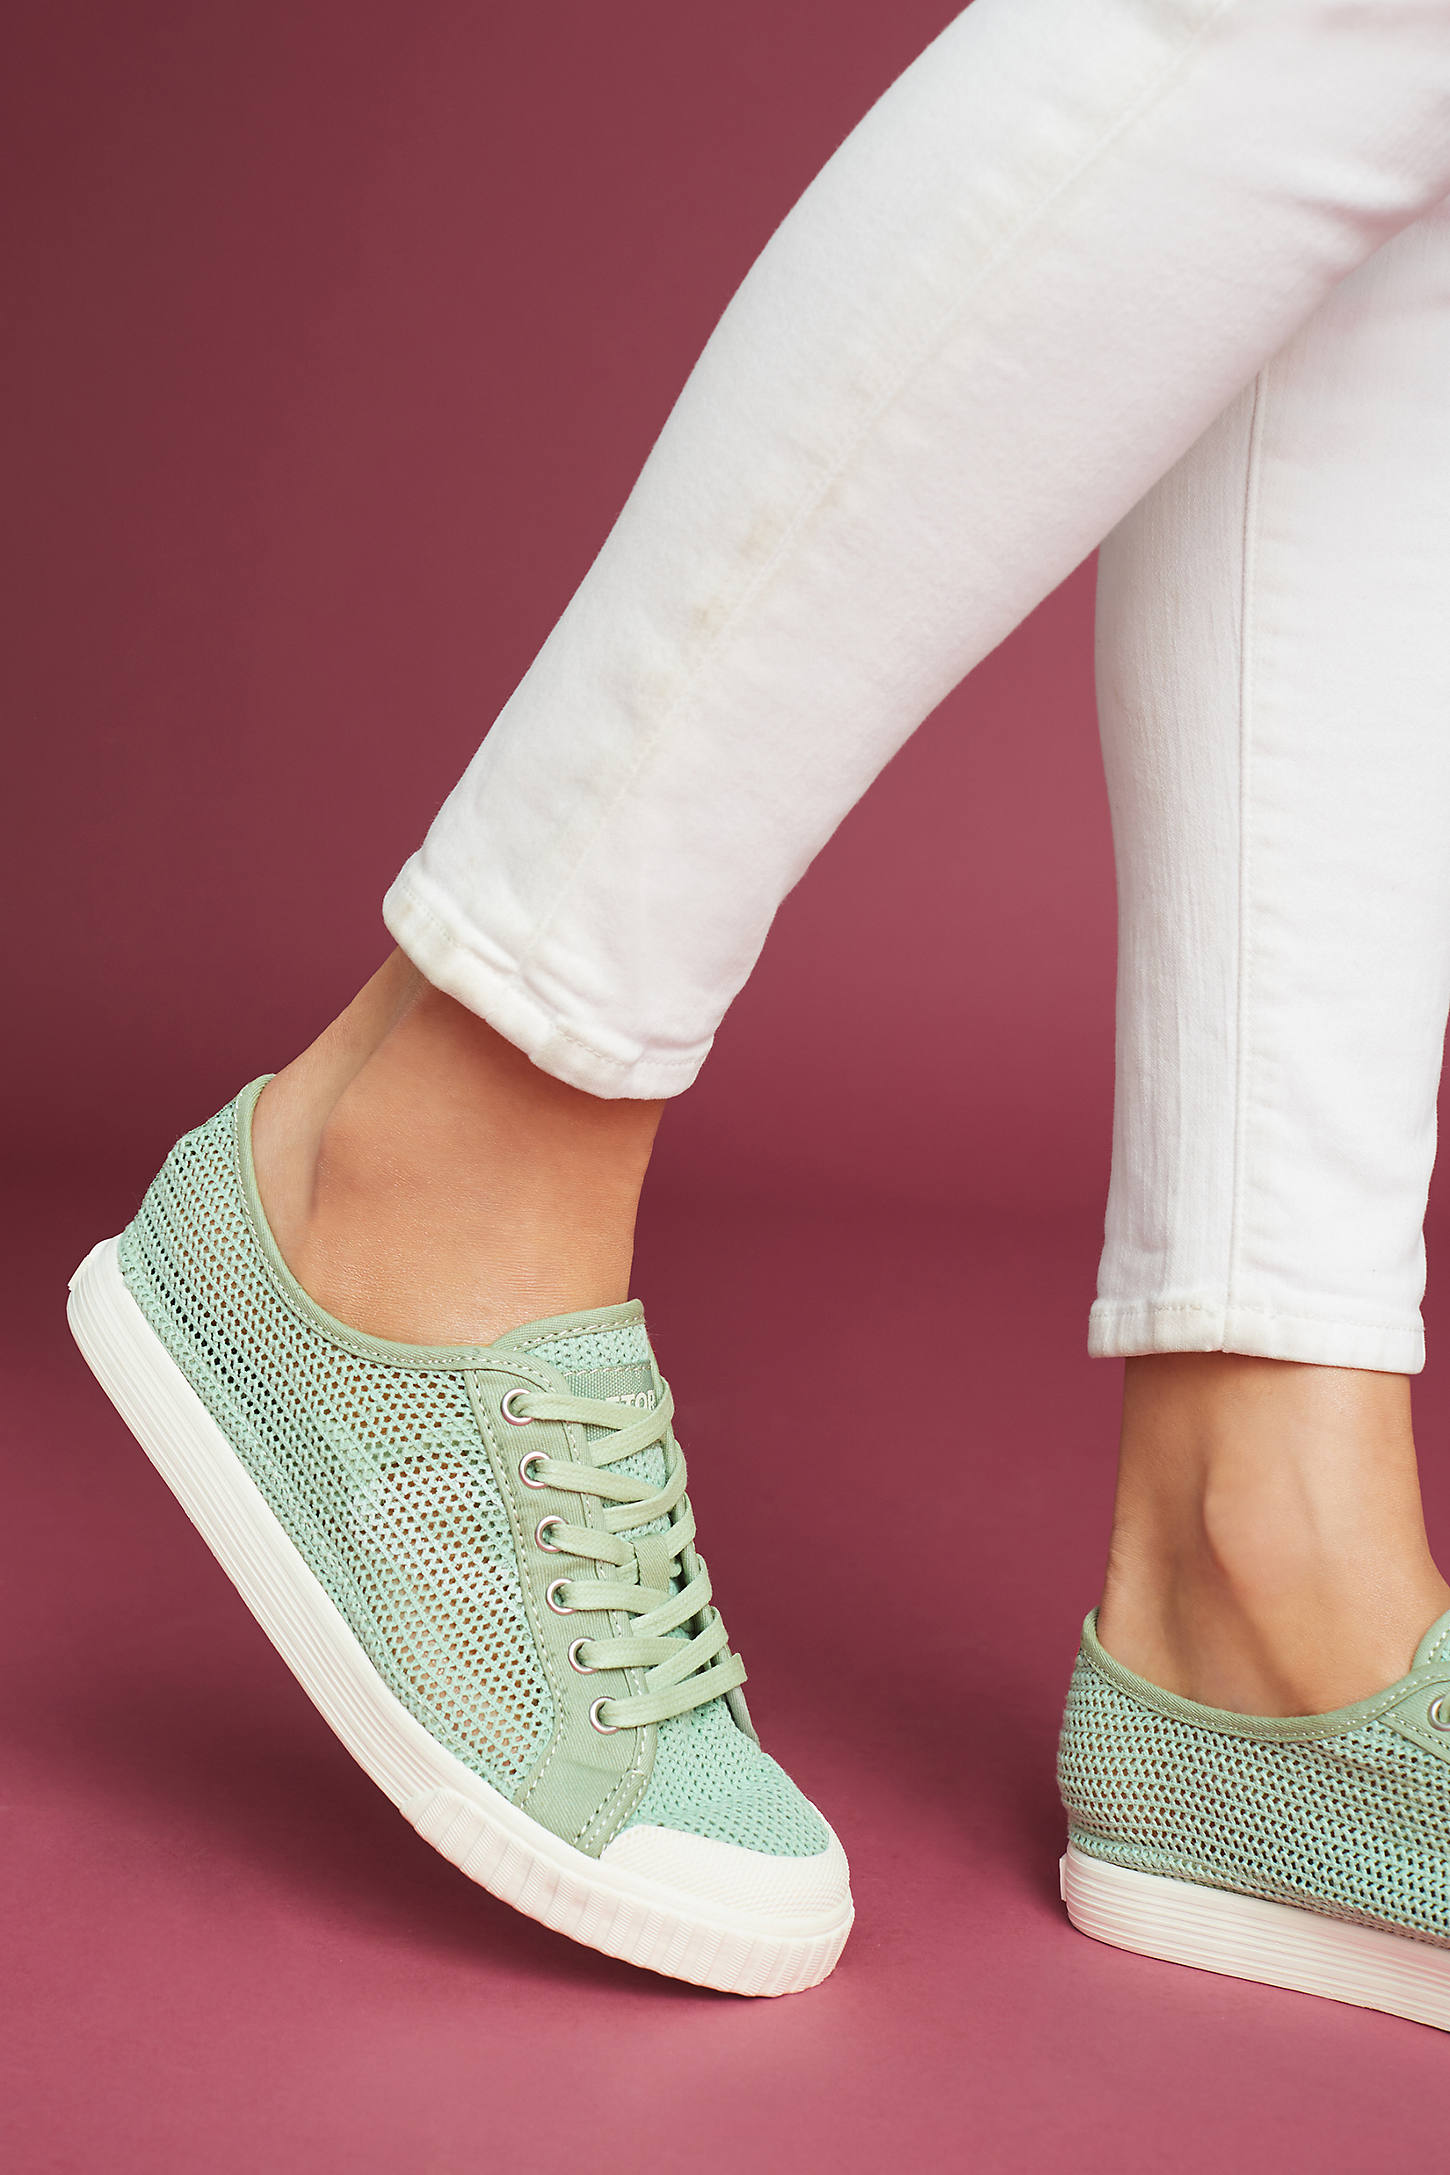 Tretorn Perforated Sneakers